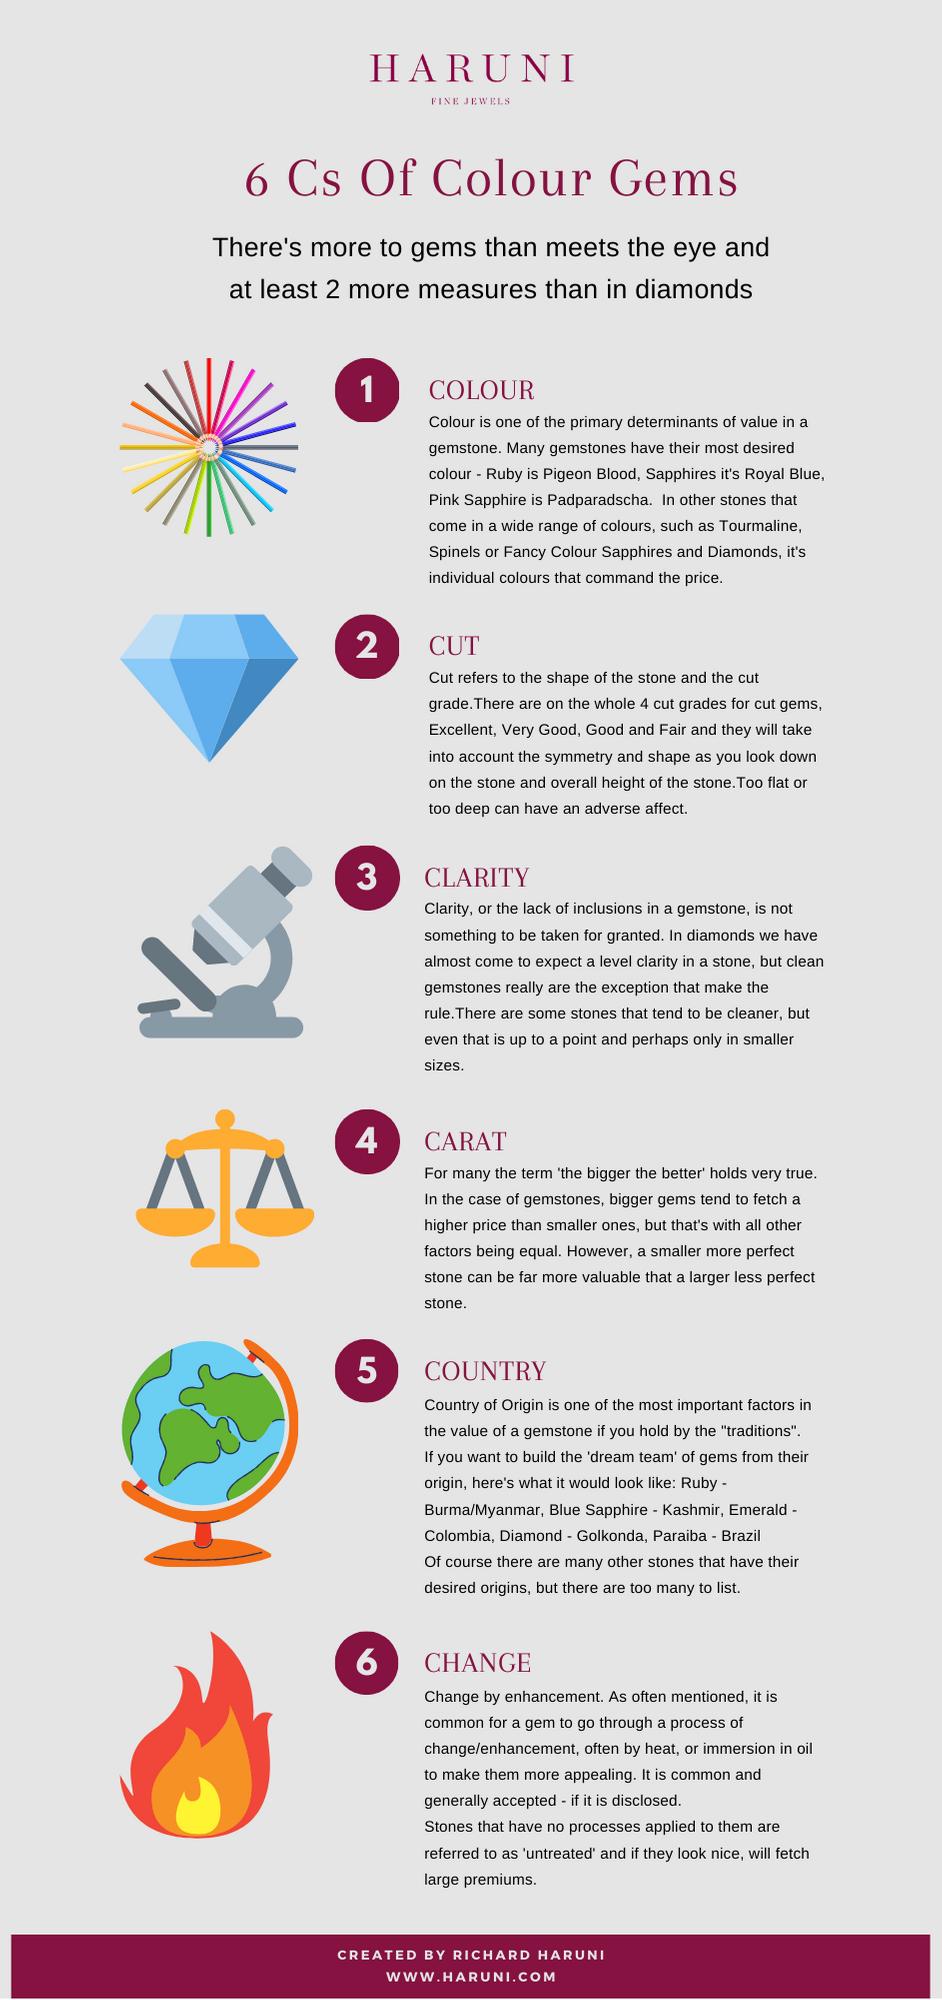 6 cs of colour gems infographic